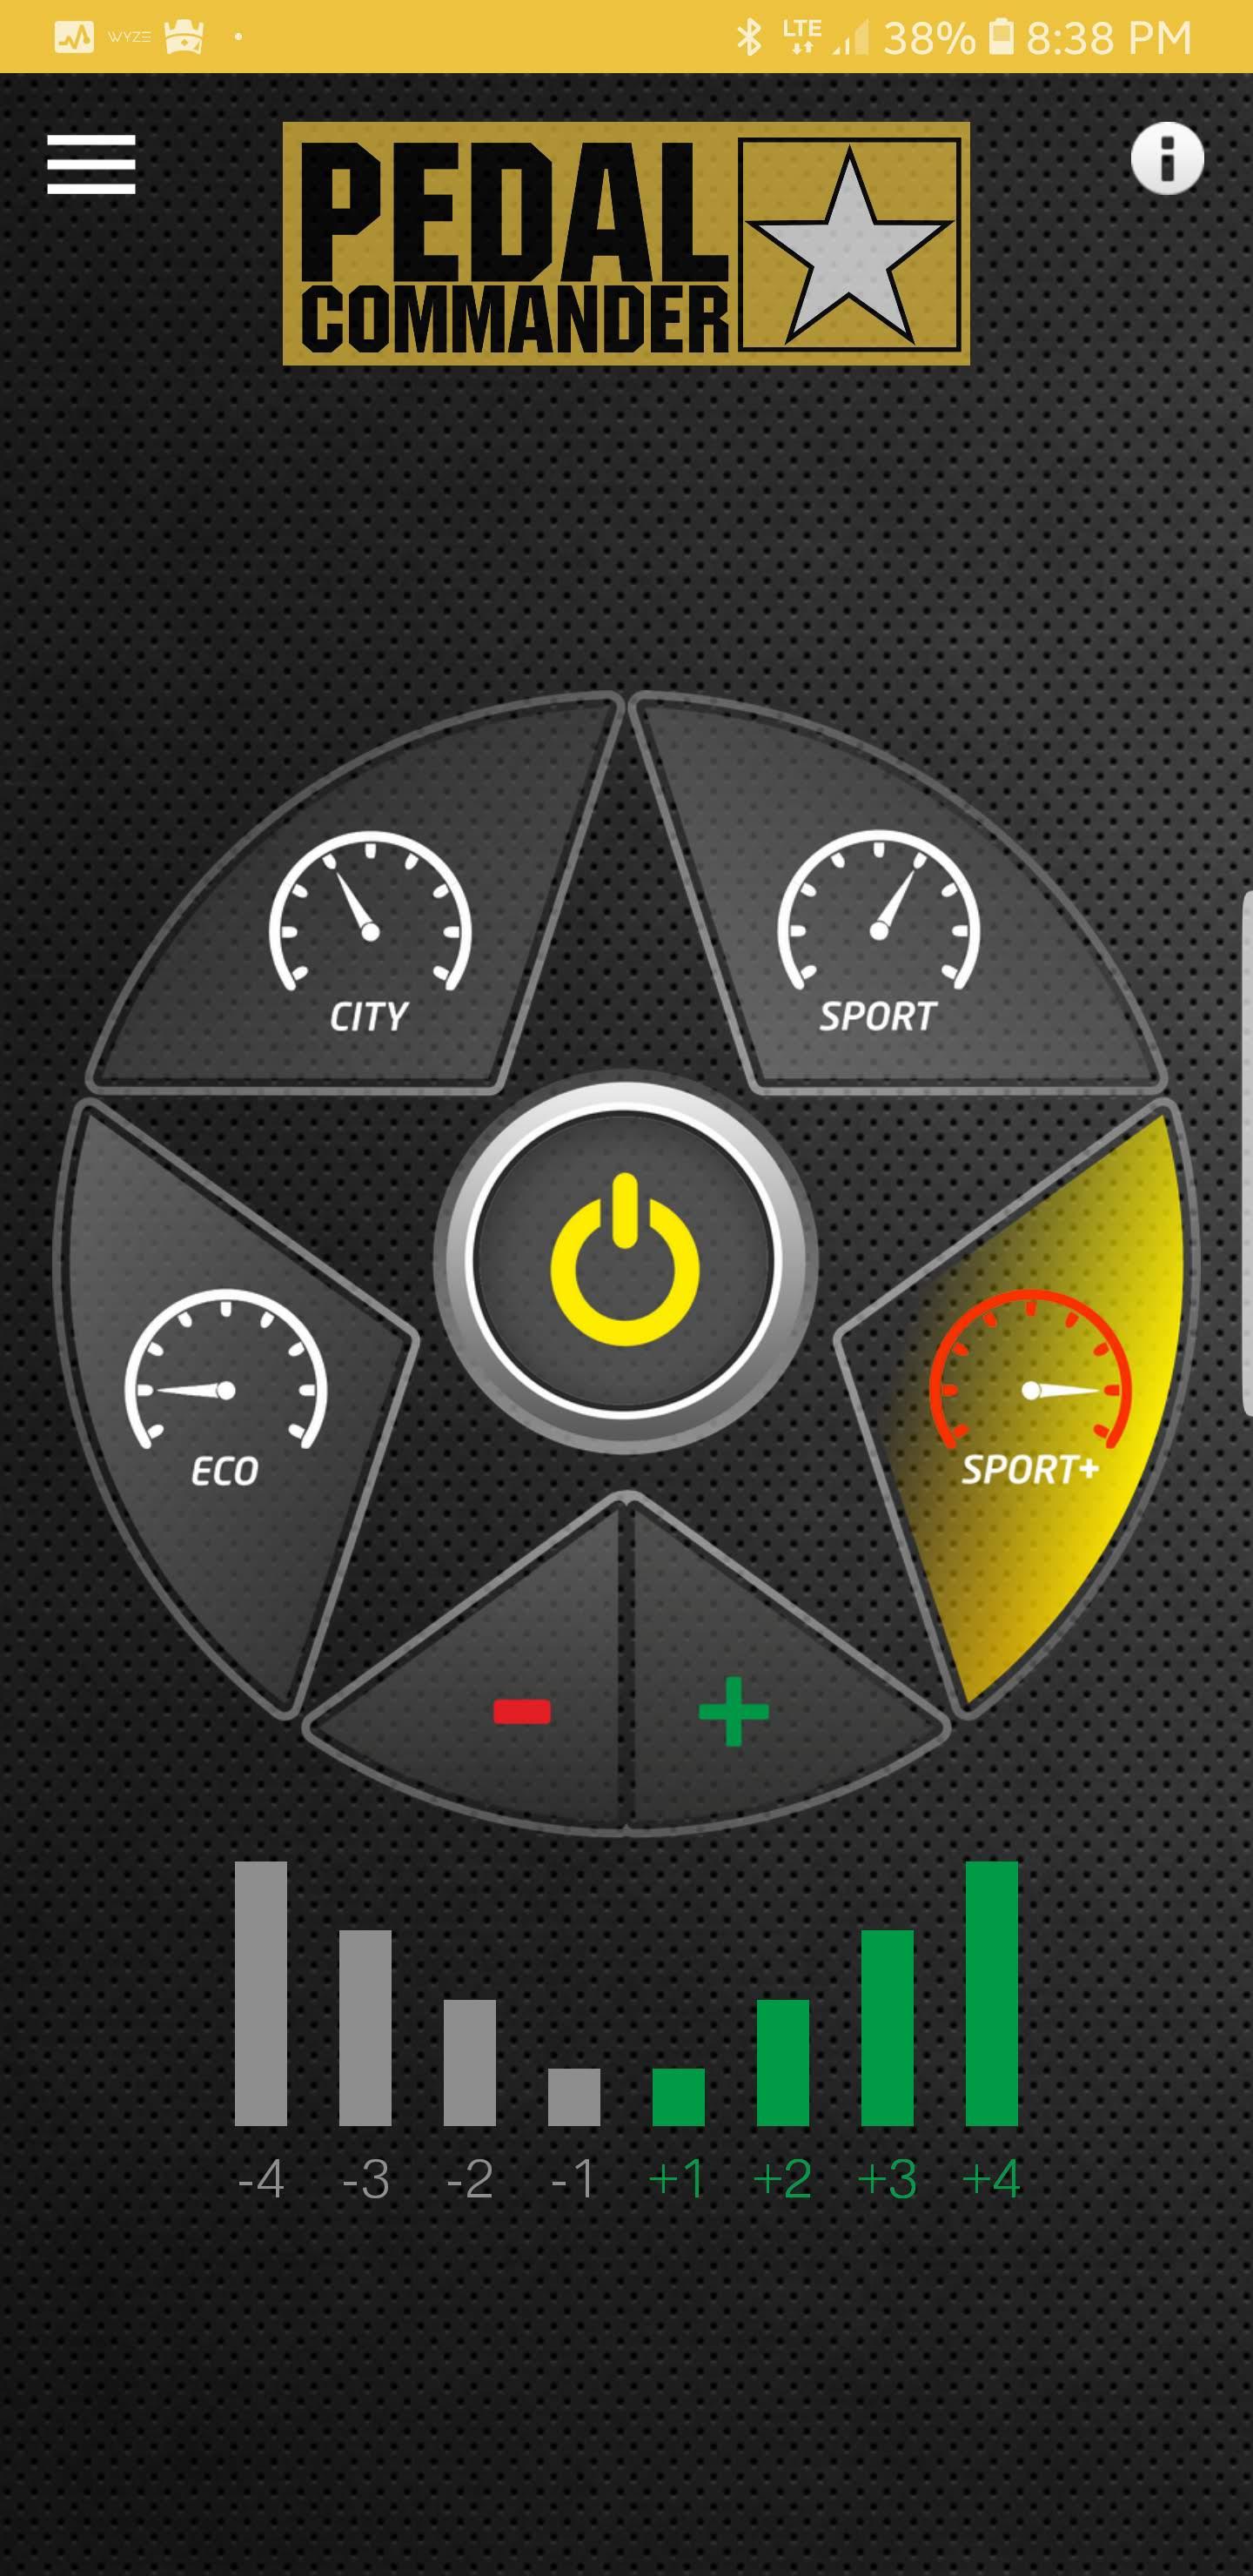 Name:  Screenshot_20190218-203811_Pedal Commander.jpg Views: 53 Size:  248.8 KB